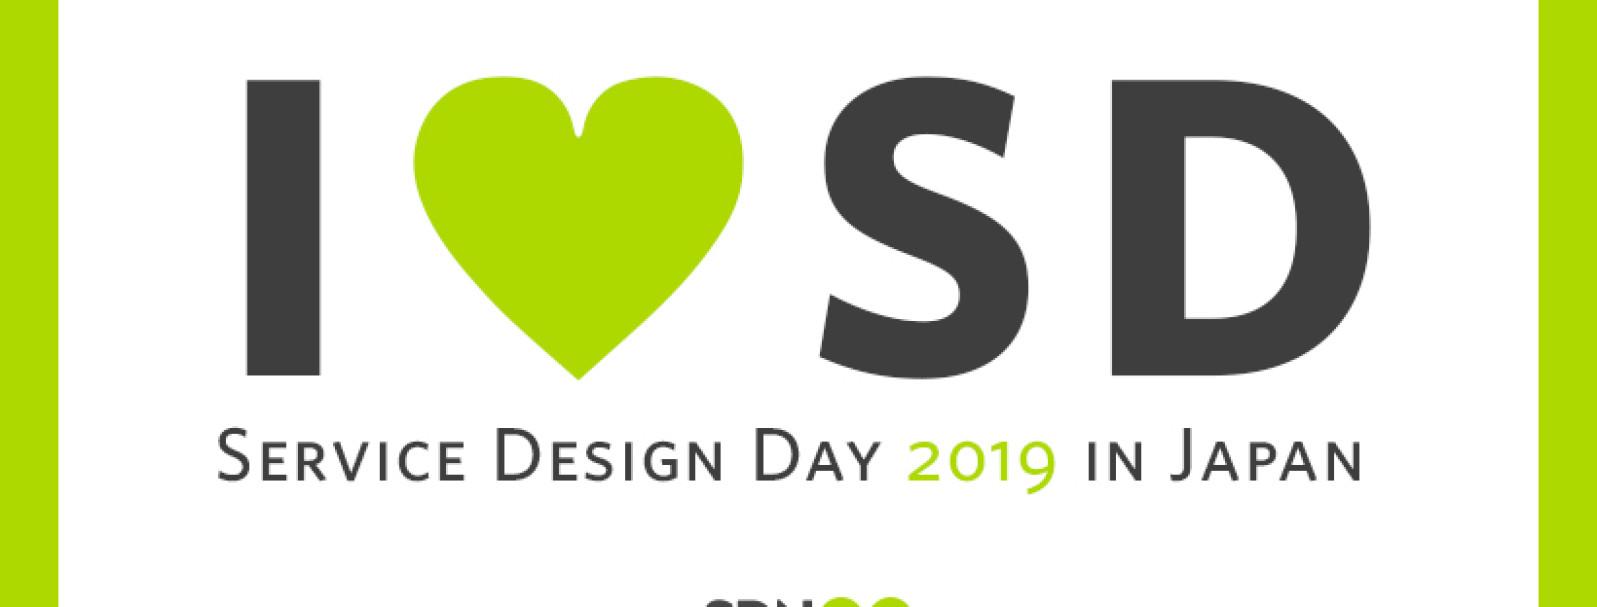 Service Design Day 2019 in Japan